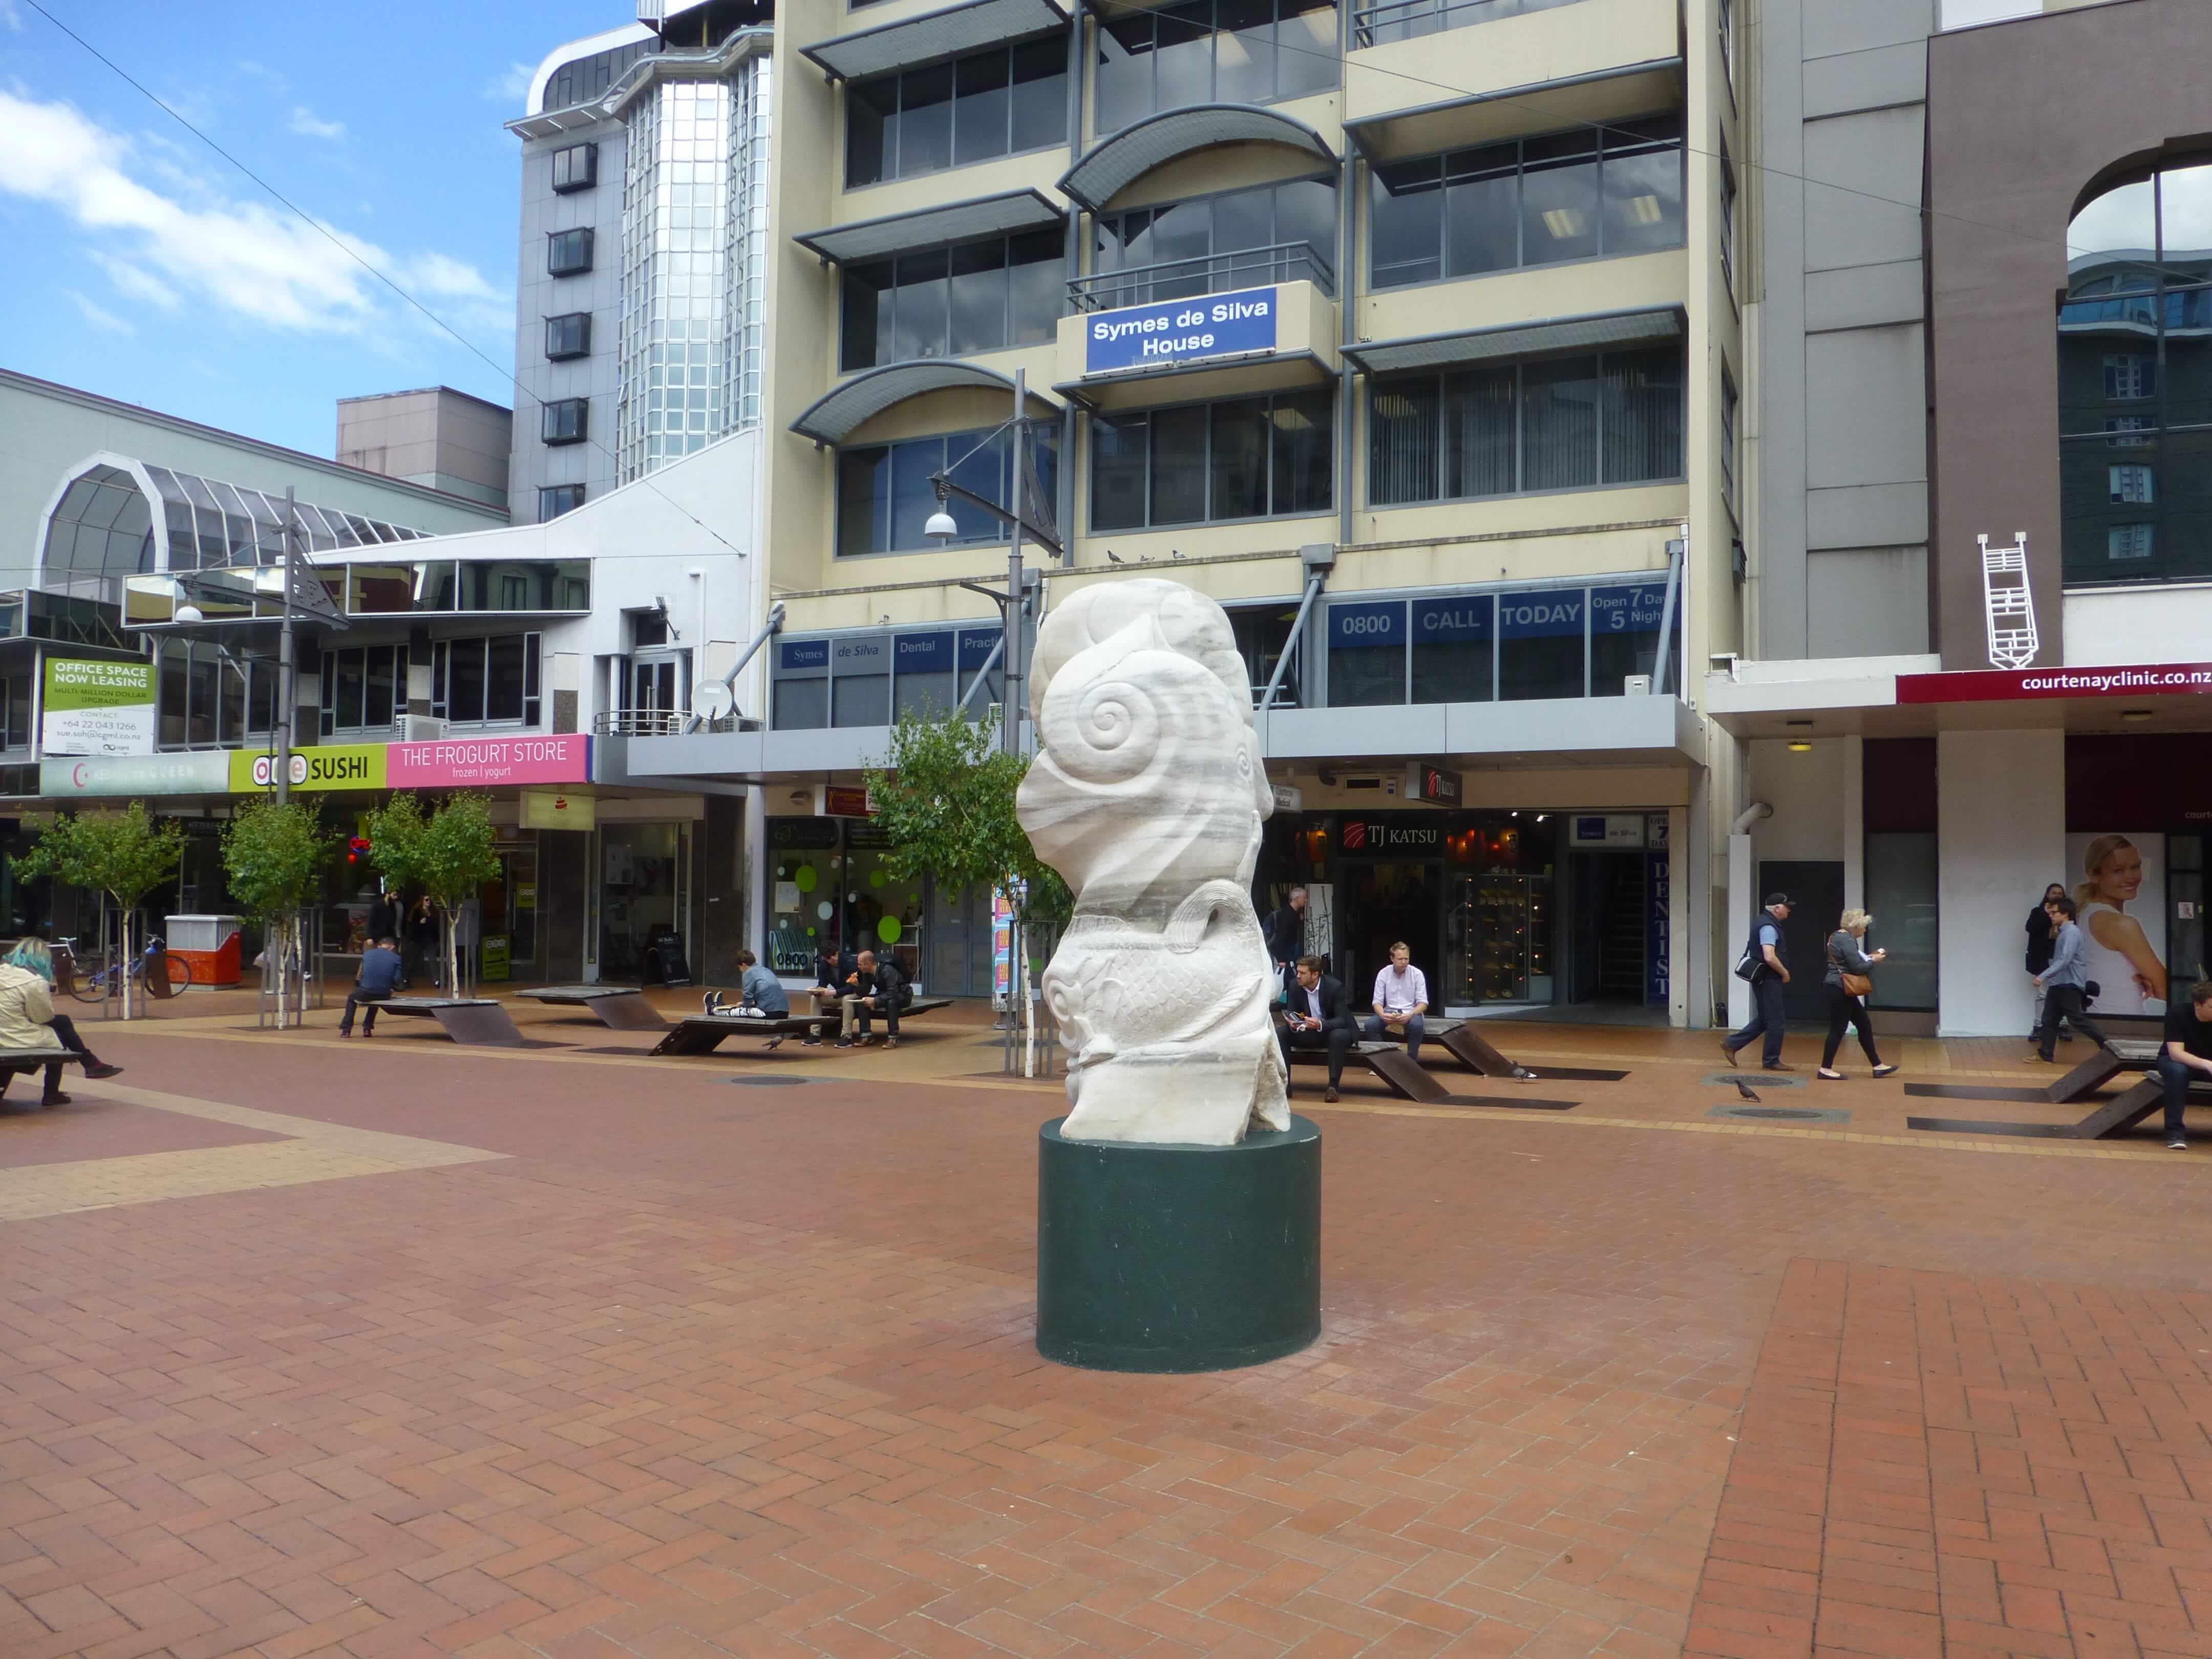 im Zentrum, Wellington, Neuseeland, Weit-weg.reisen 20